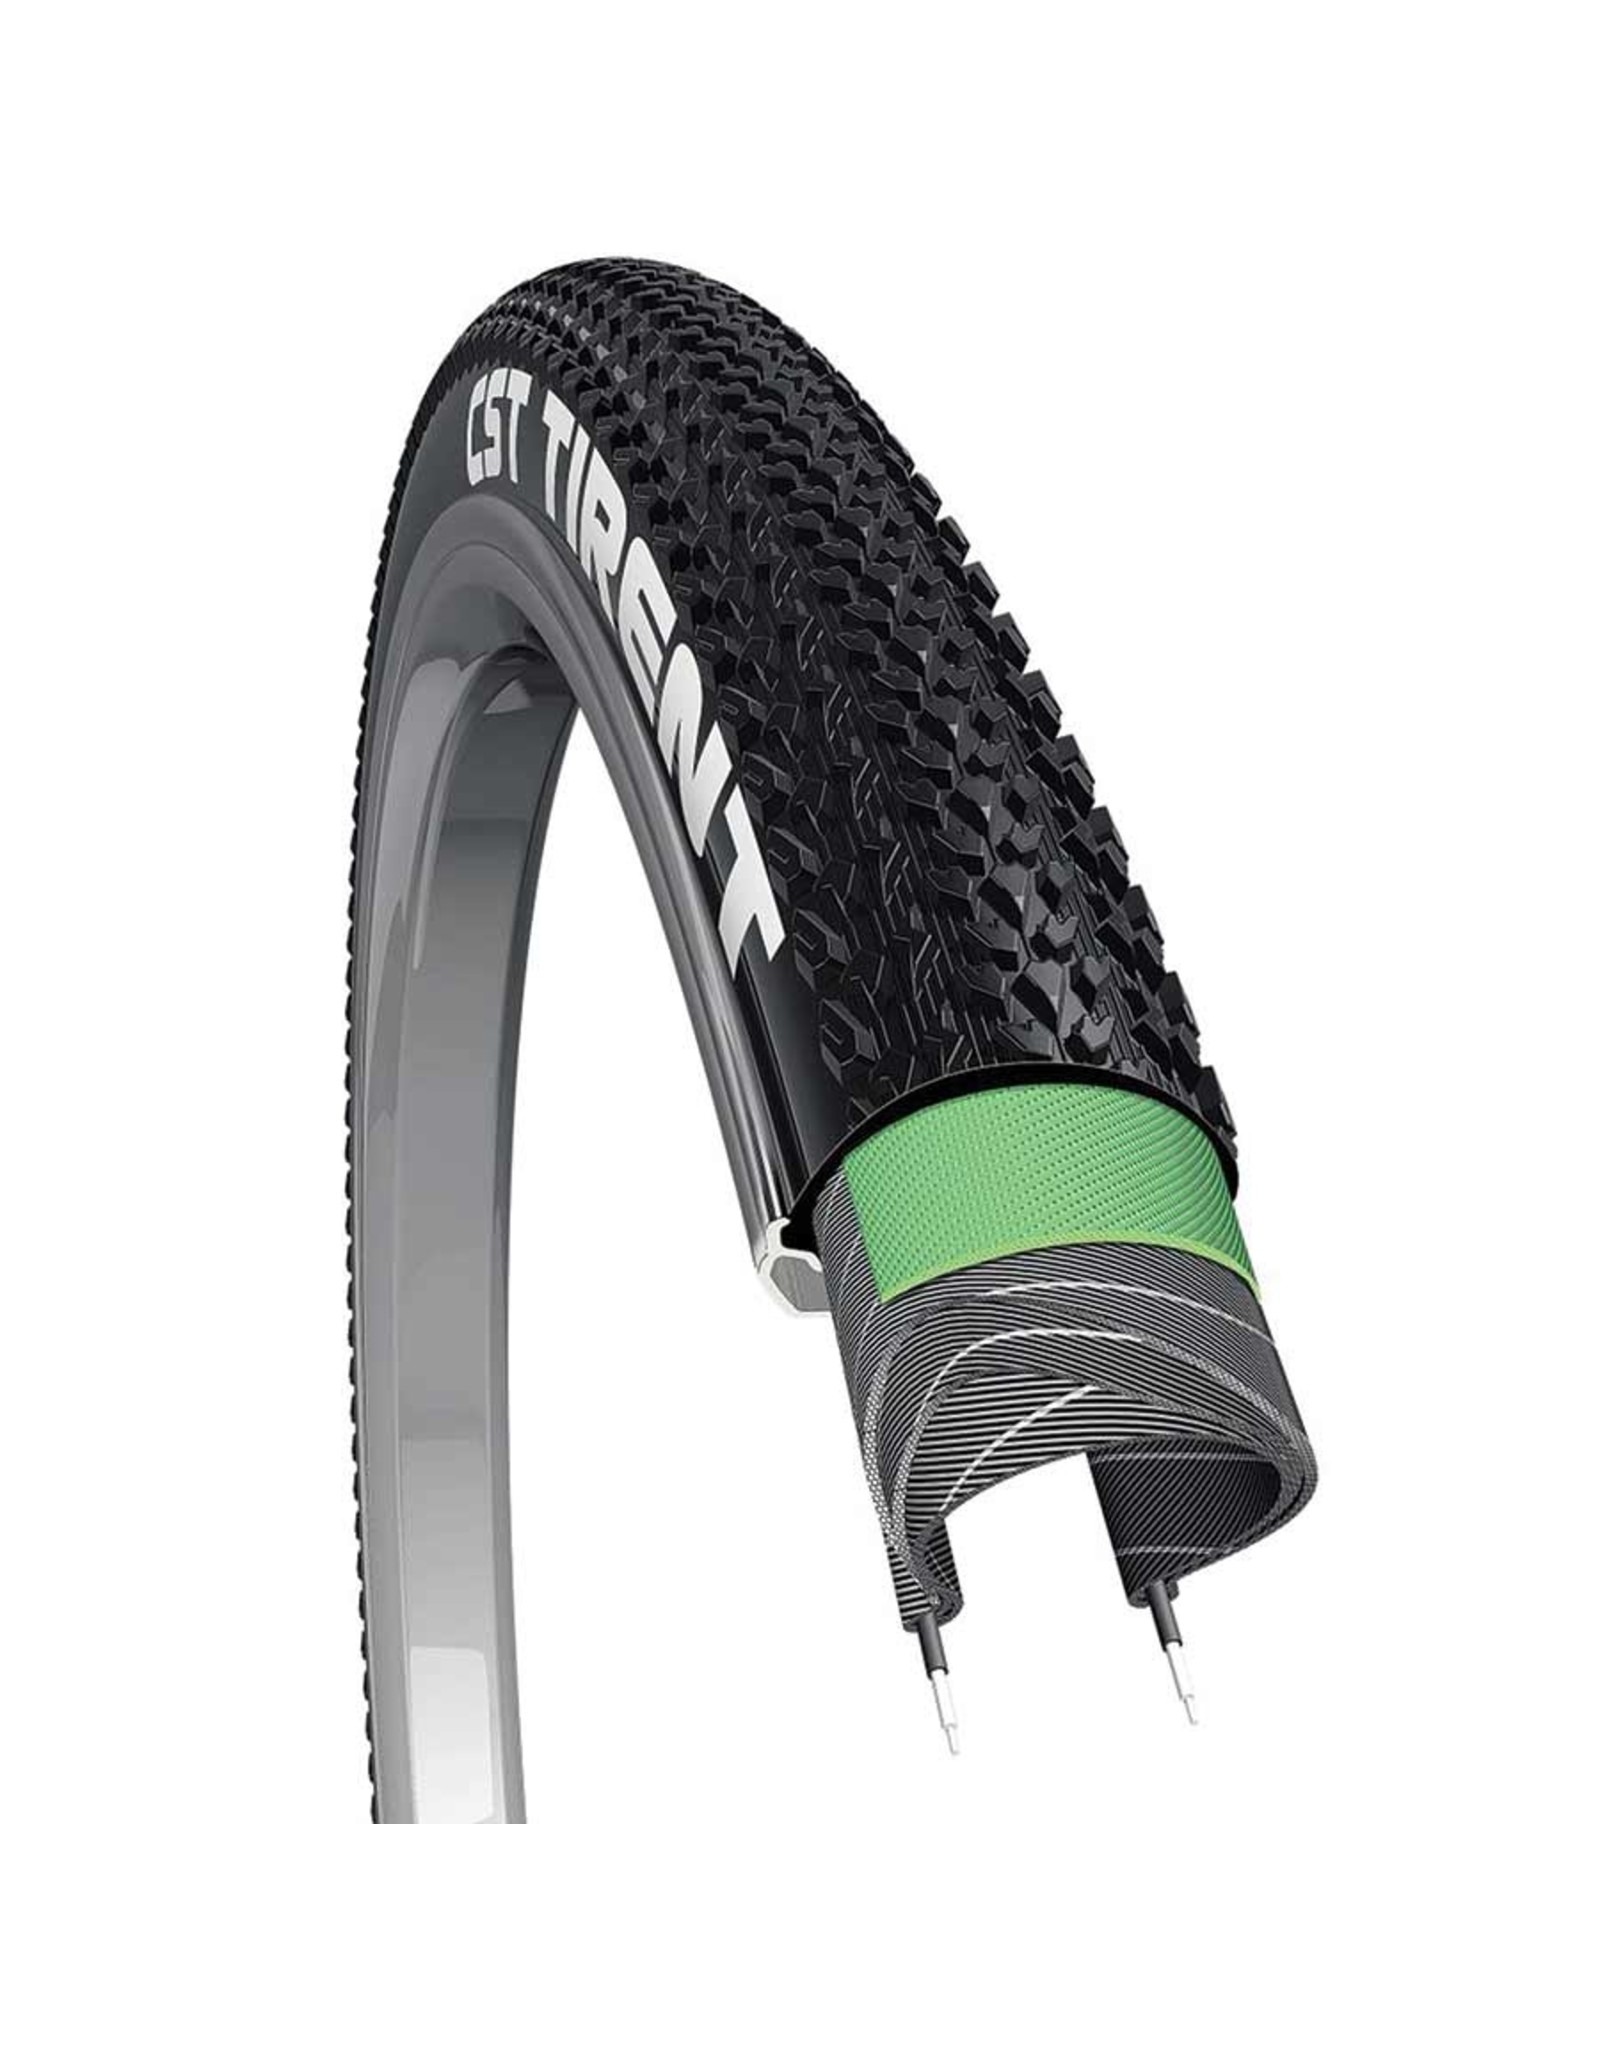 CST, Tirent, Tire, 700x40C, Wire, Clincher, Dual, EPS, 60TPI, Black